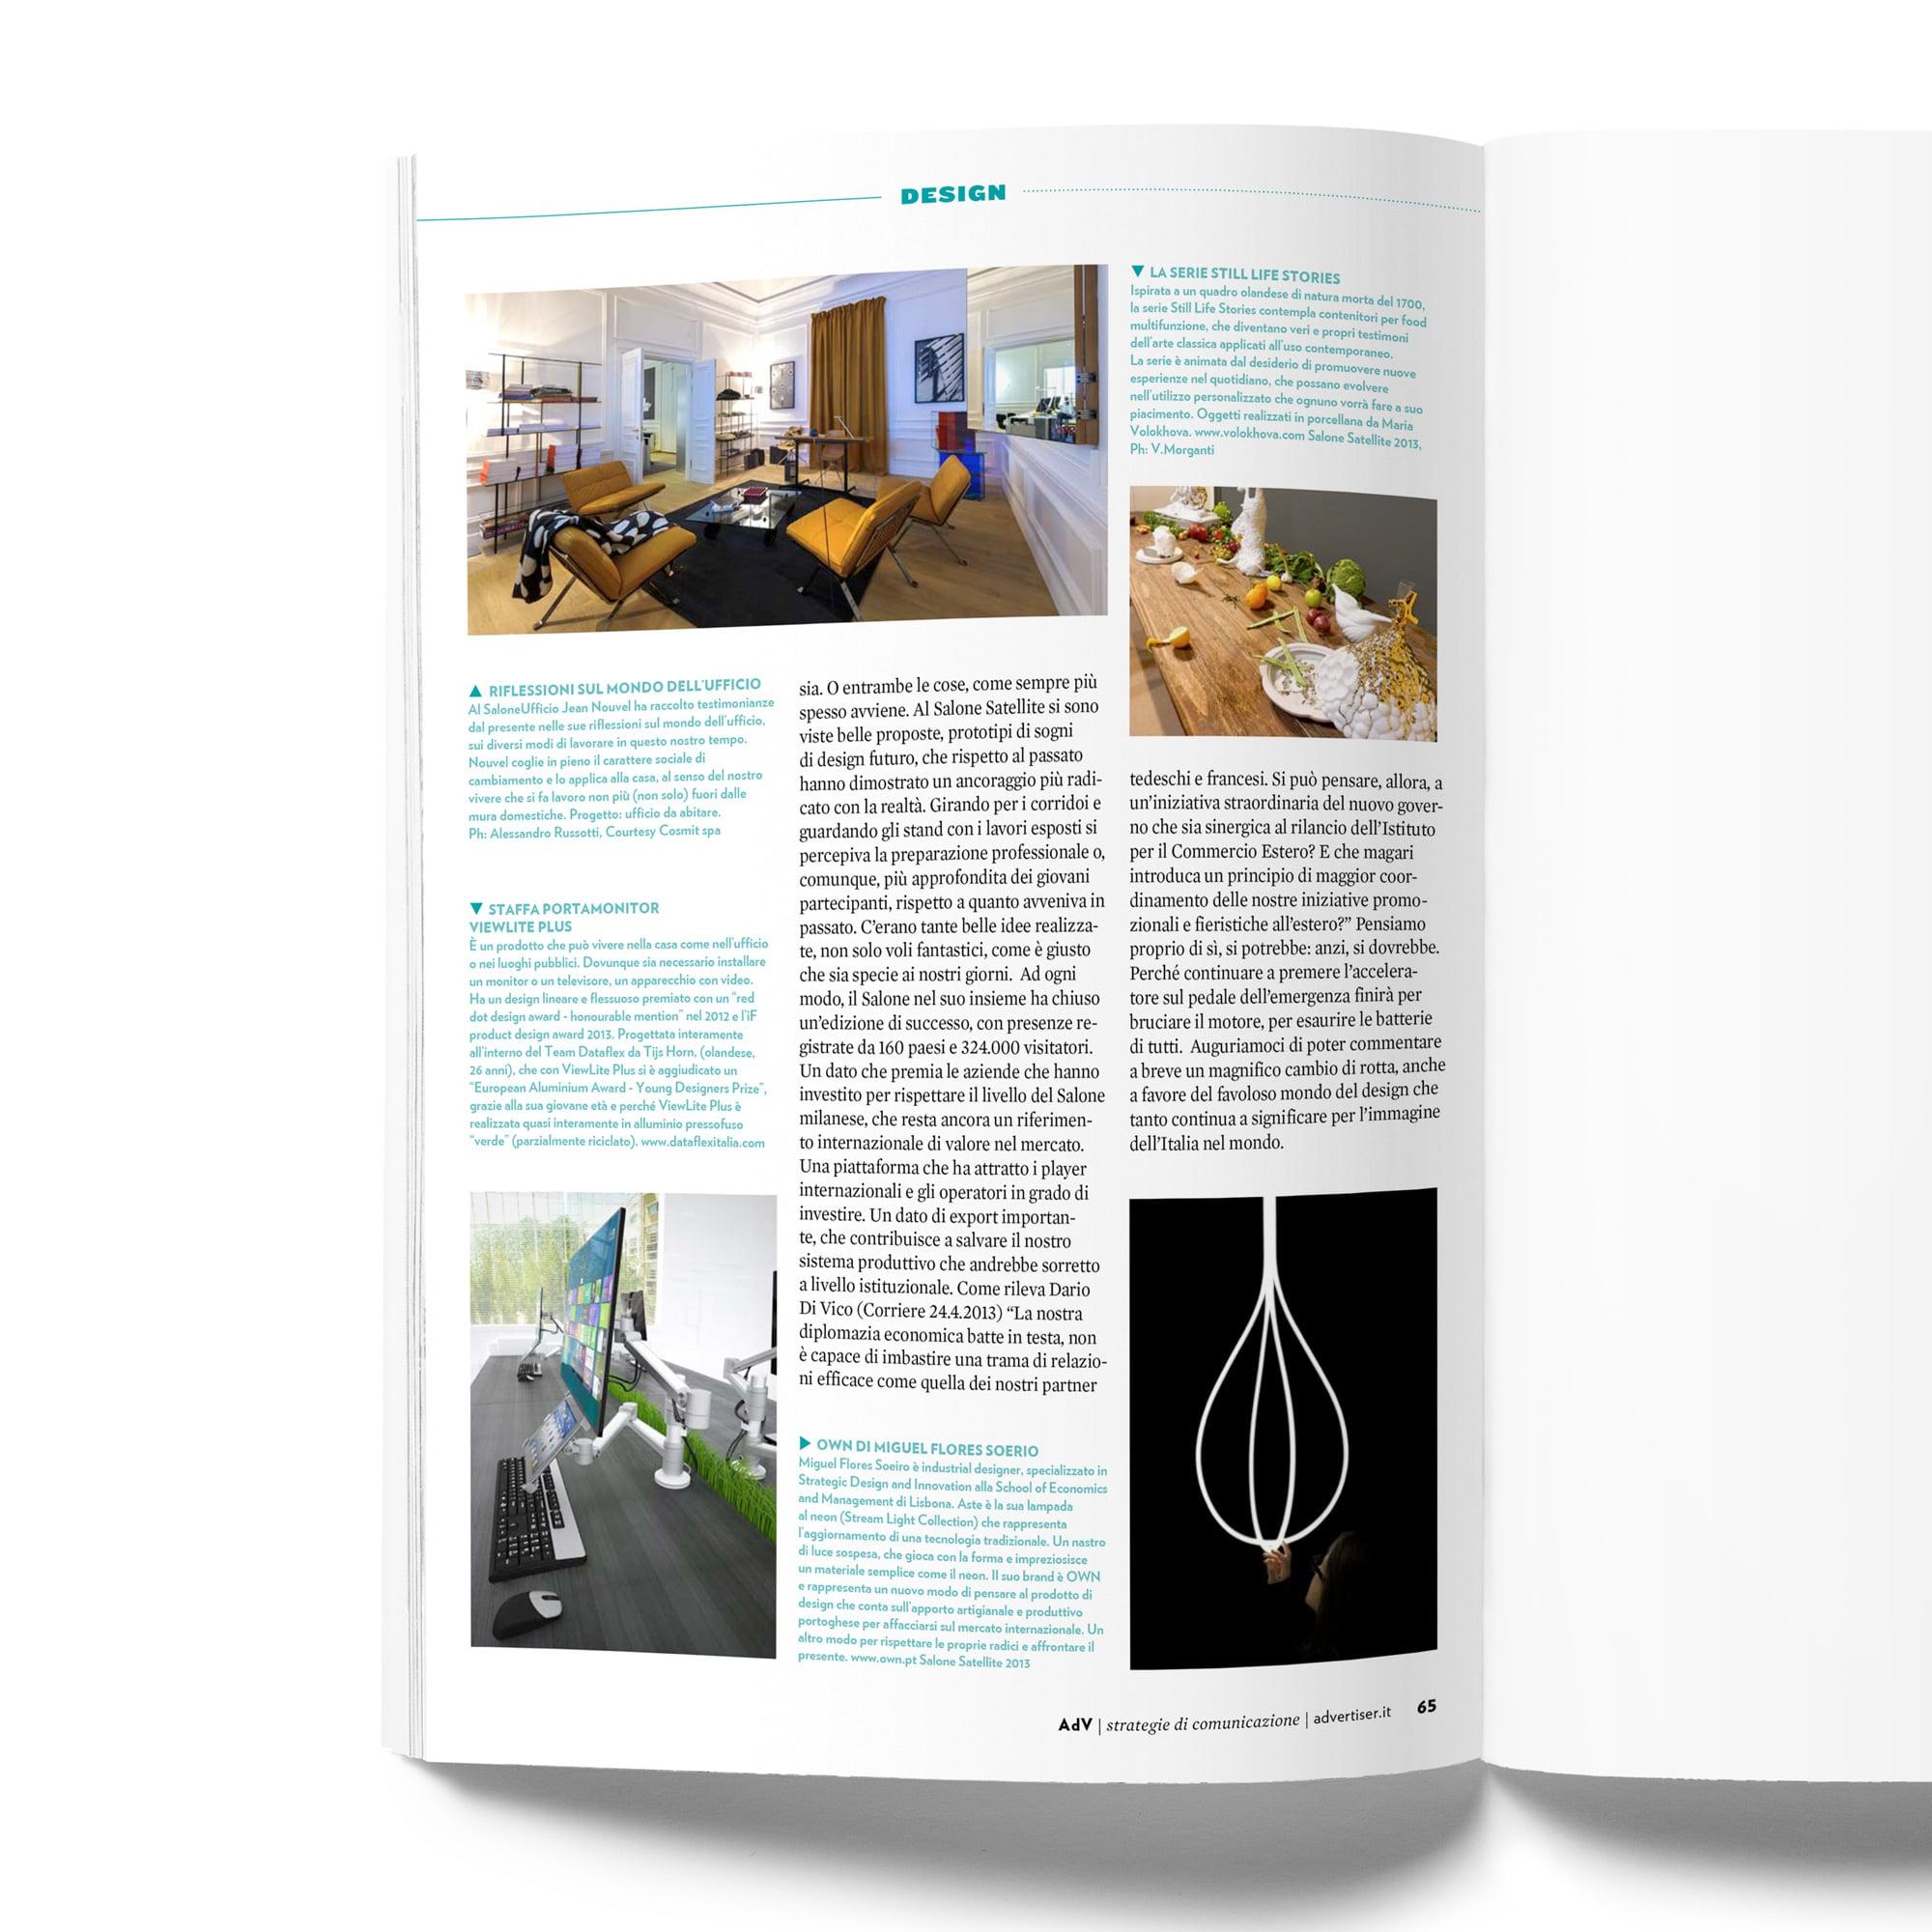 Adv Page- DESIGN BY MIGUEL SOEIRO